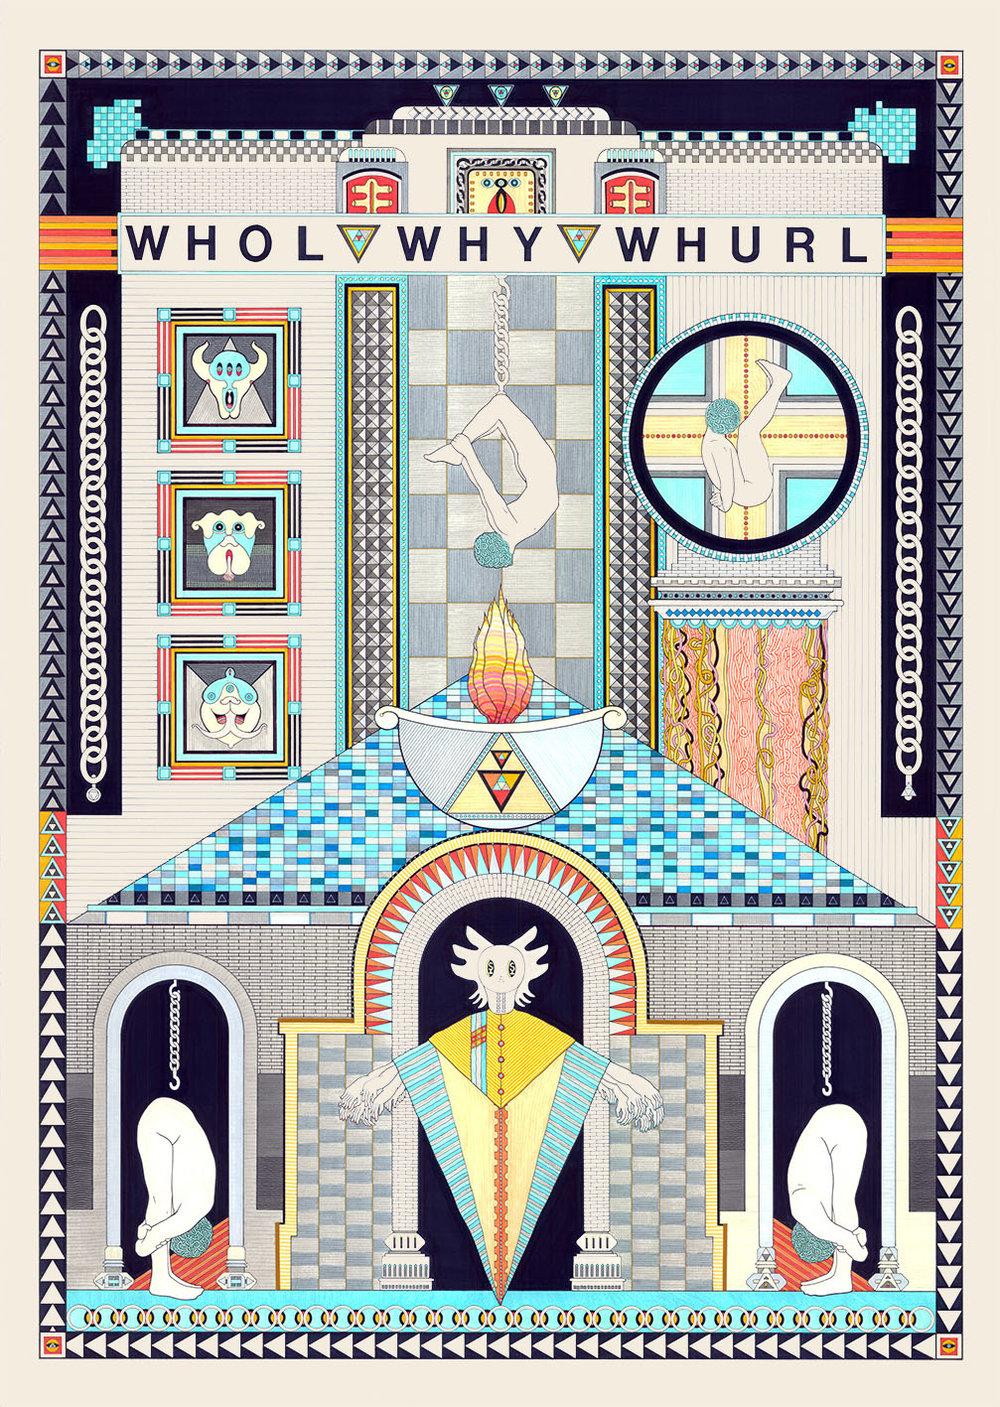 Whol Why Whurl, 2013